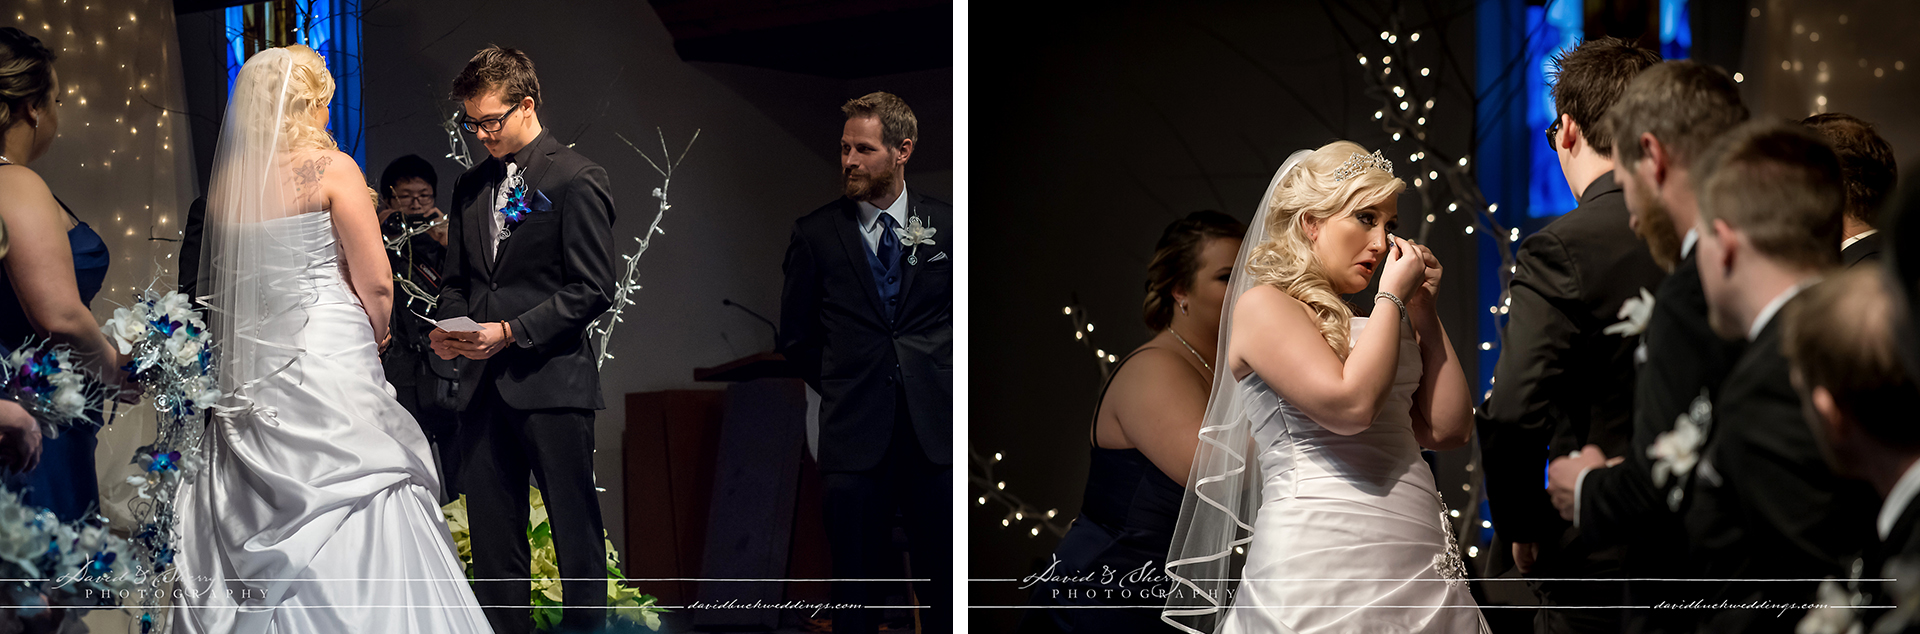 Abbotsford_Wedding_Photography_Secret_Garden_12